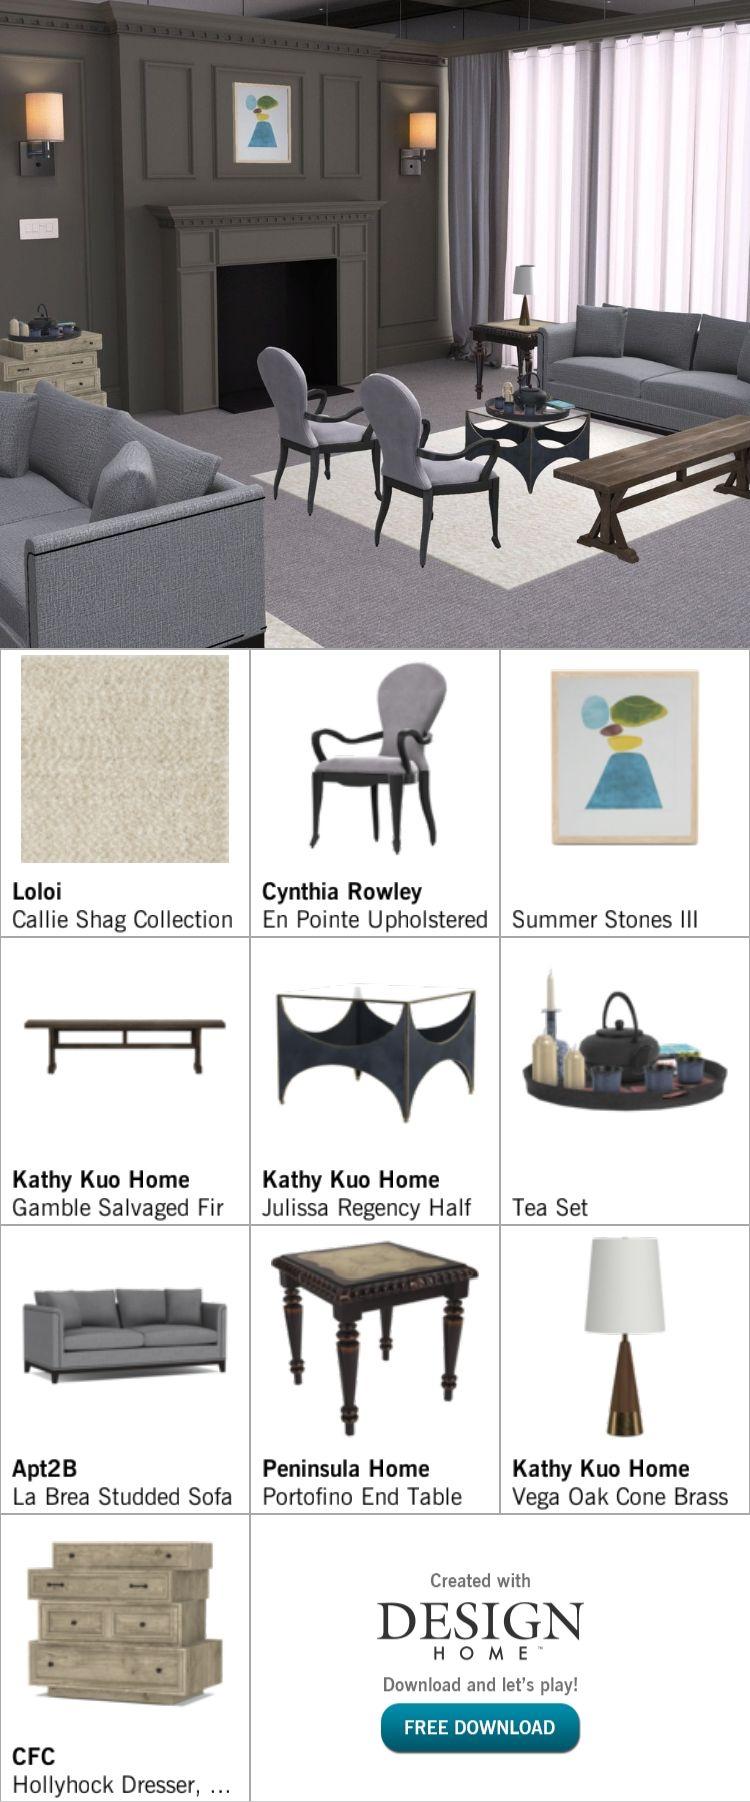 Created With Design Home House Design Home Interior Design